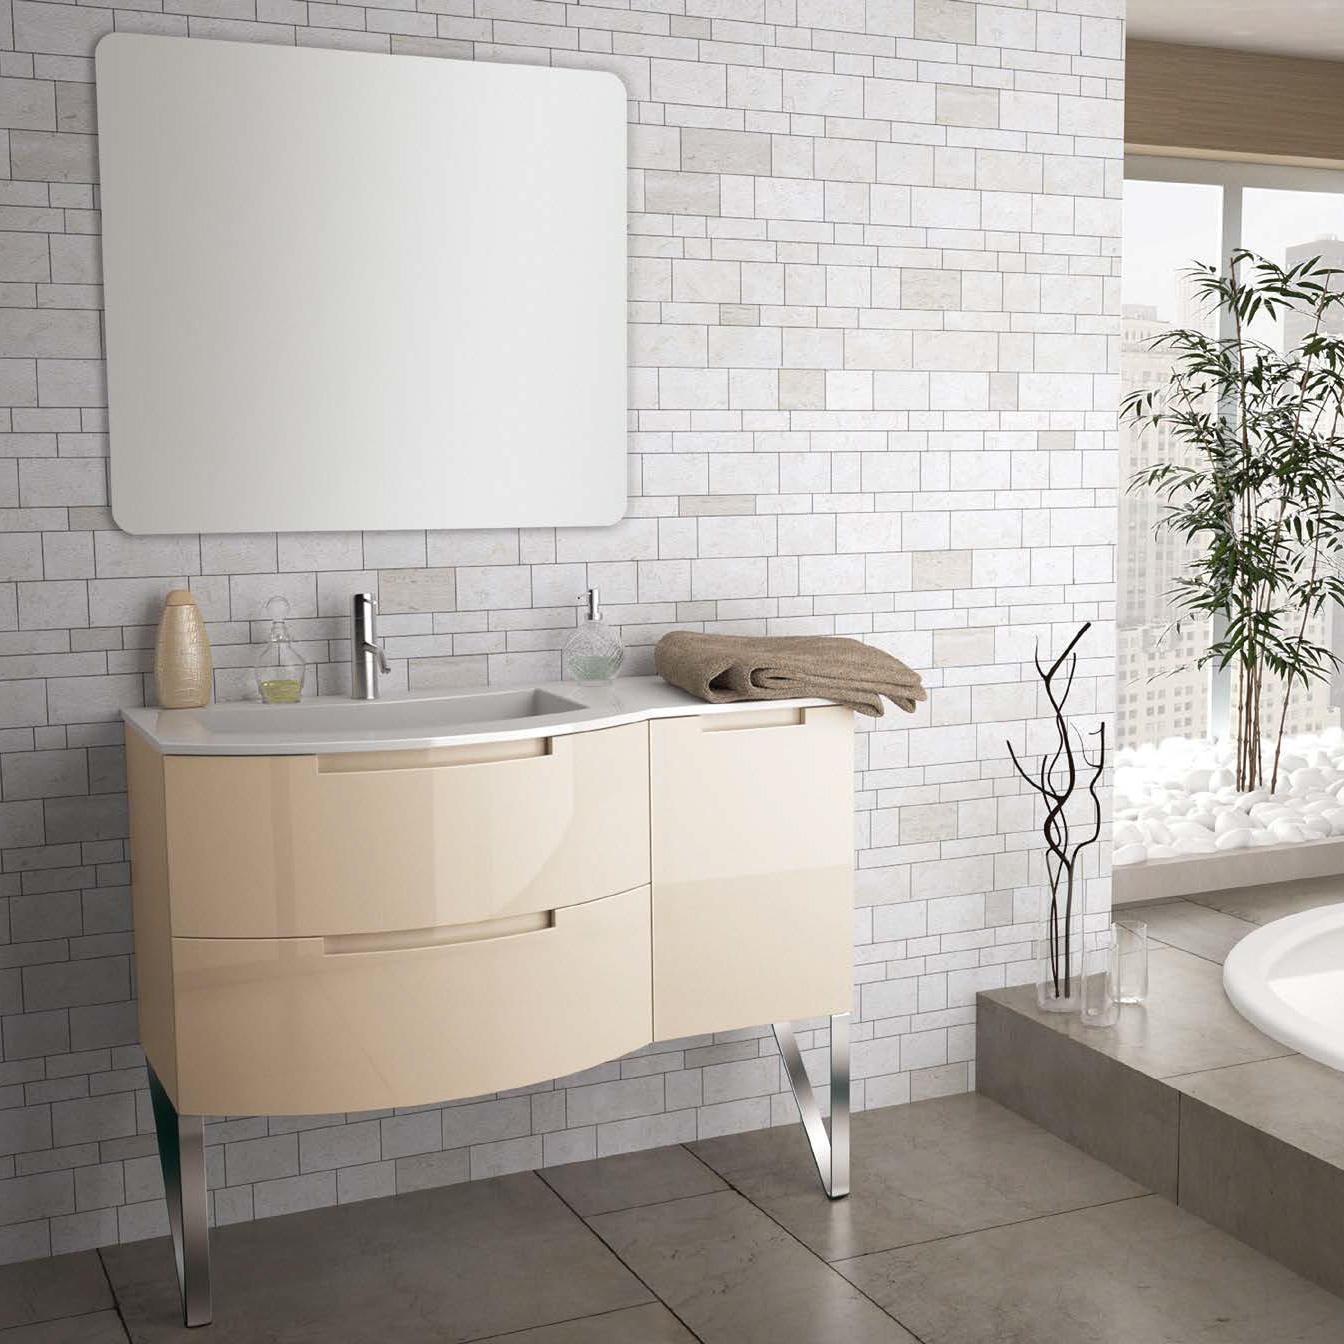 43 Inch Modern Floating Bathroom Vanity Sand Glossy Finish